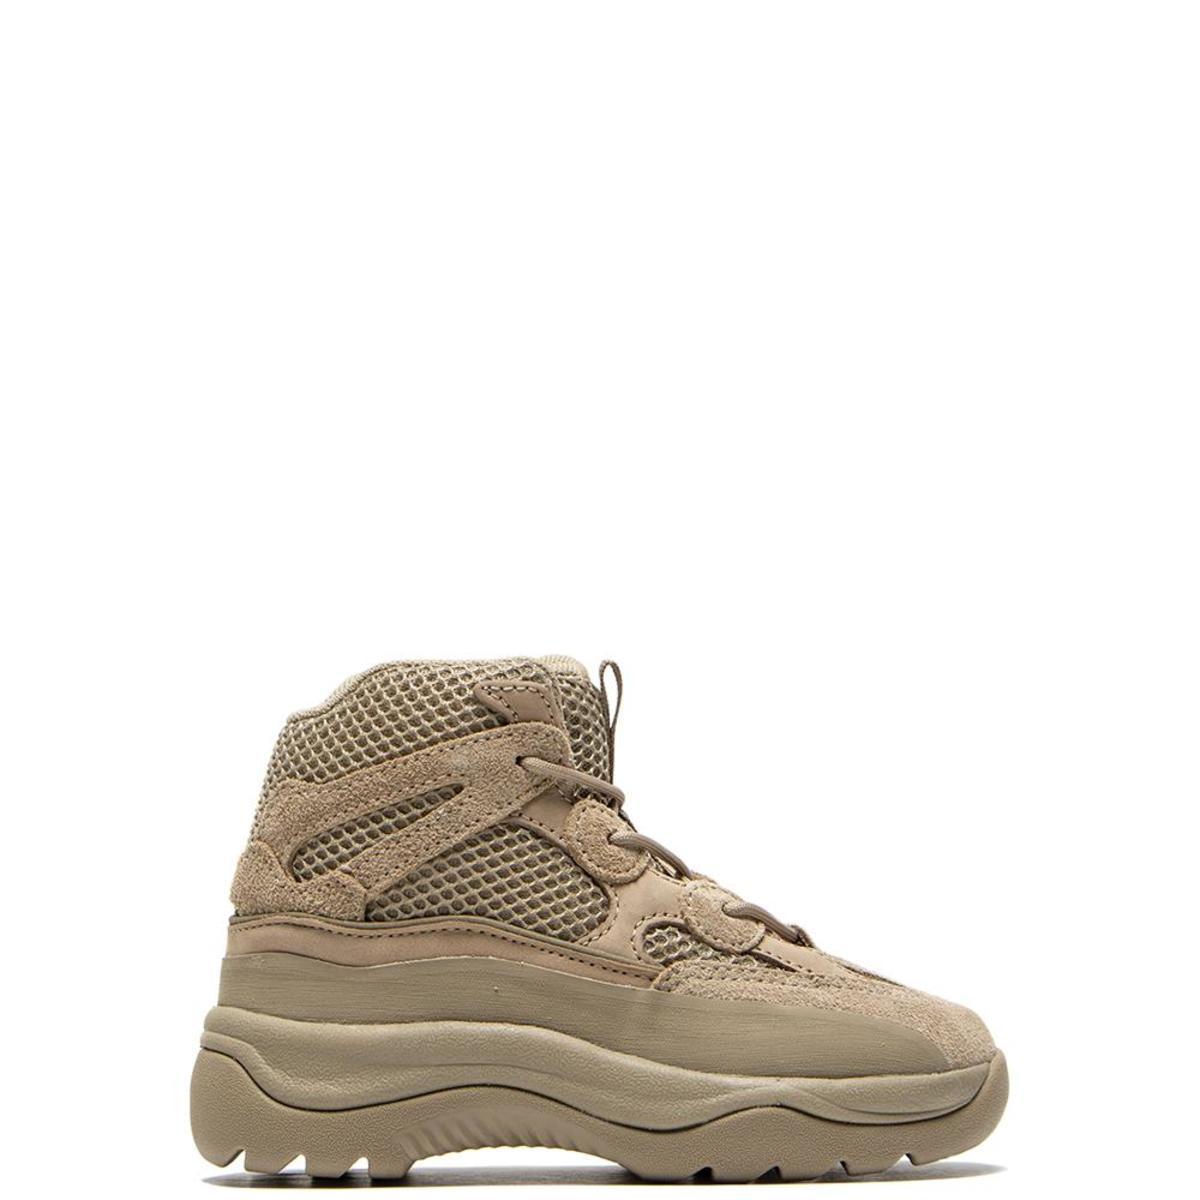 KIDS adidas Originals Yeezy Desert Boot